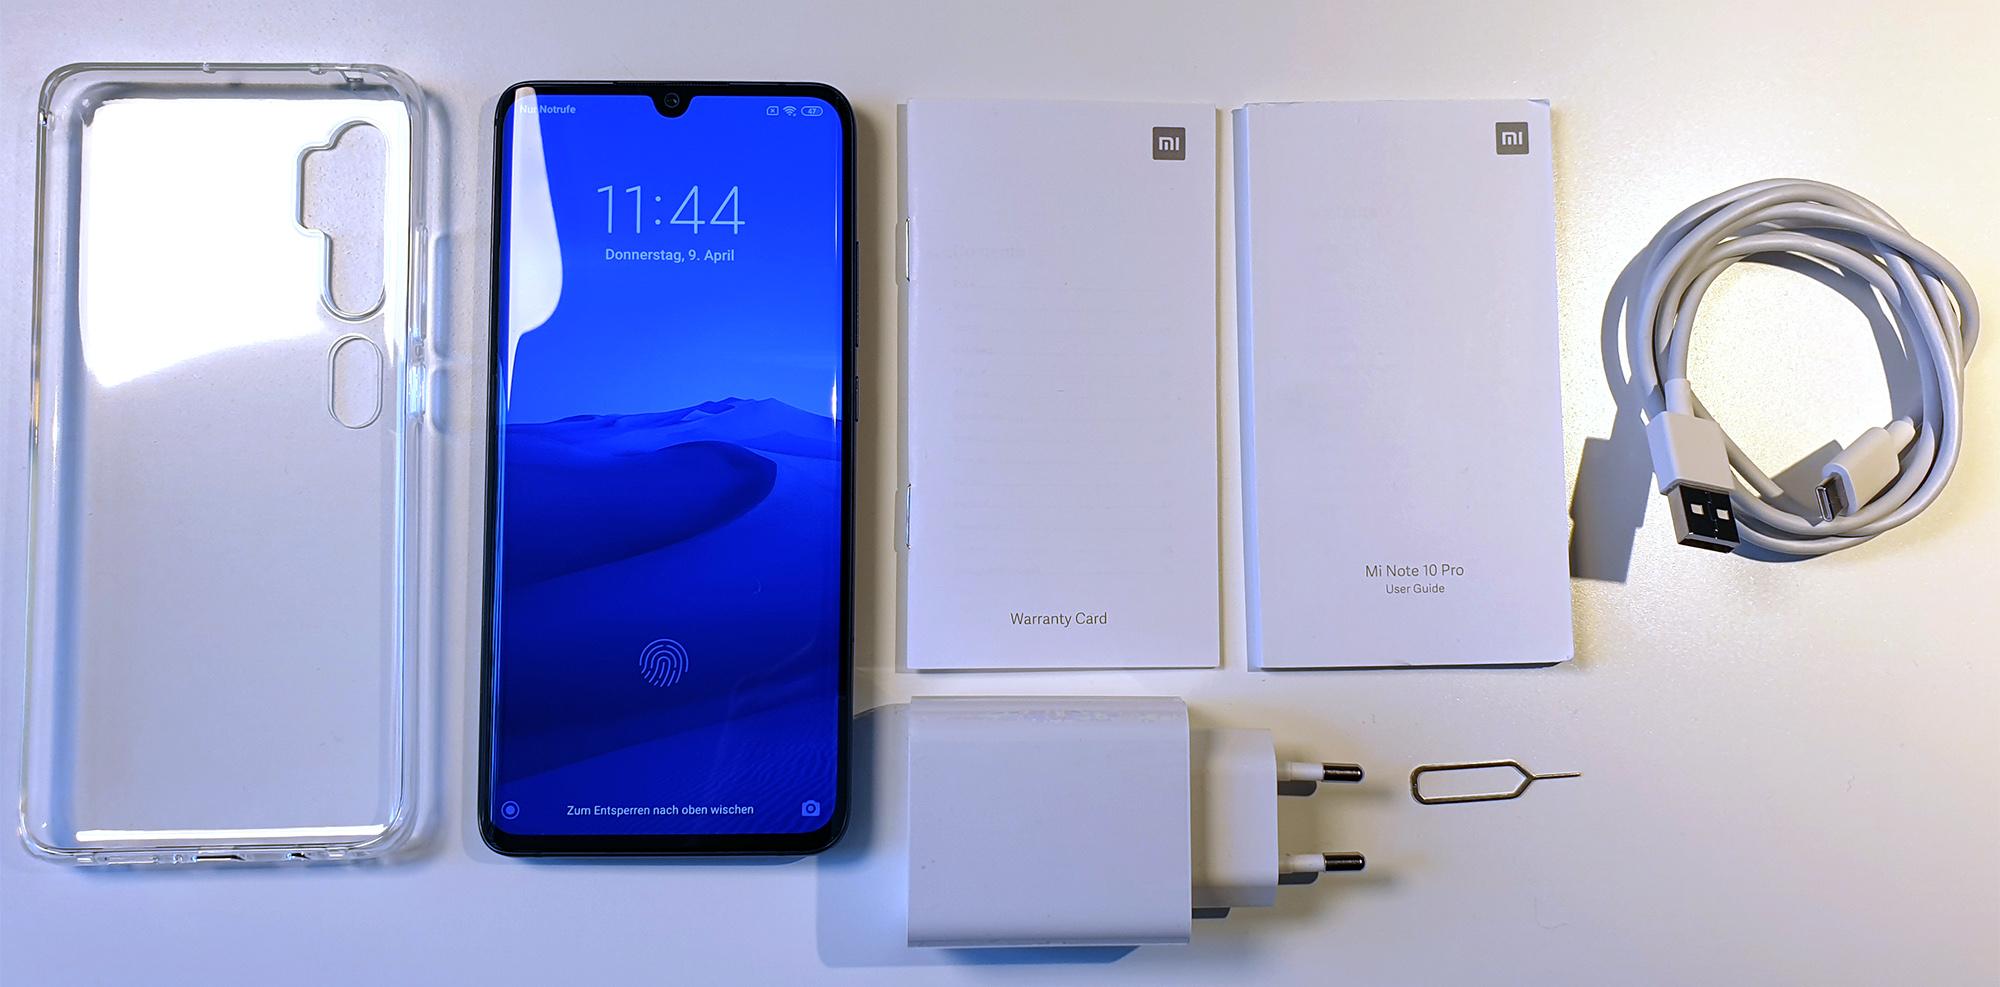 Xiaomi Mi Note 10 Pro: Lieferumfang